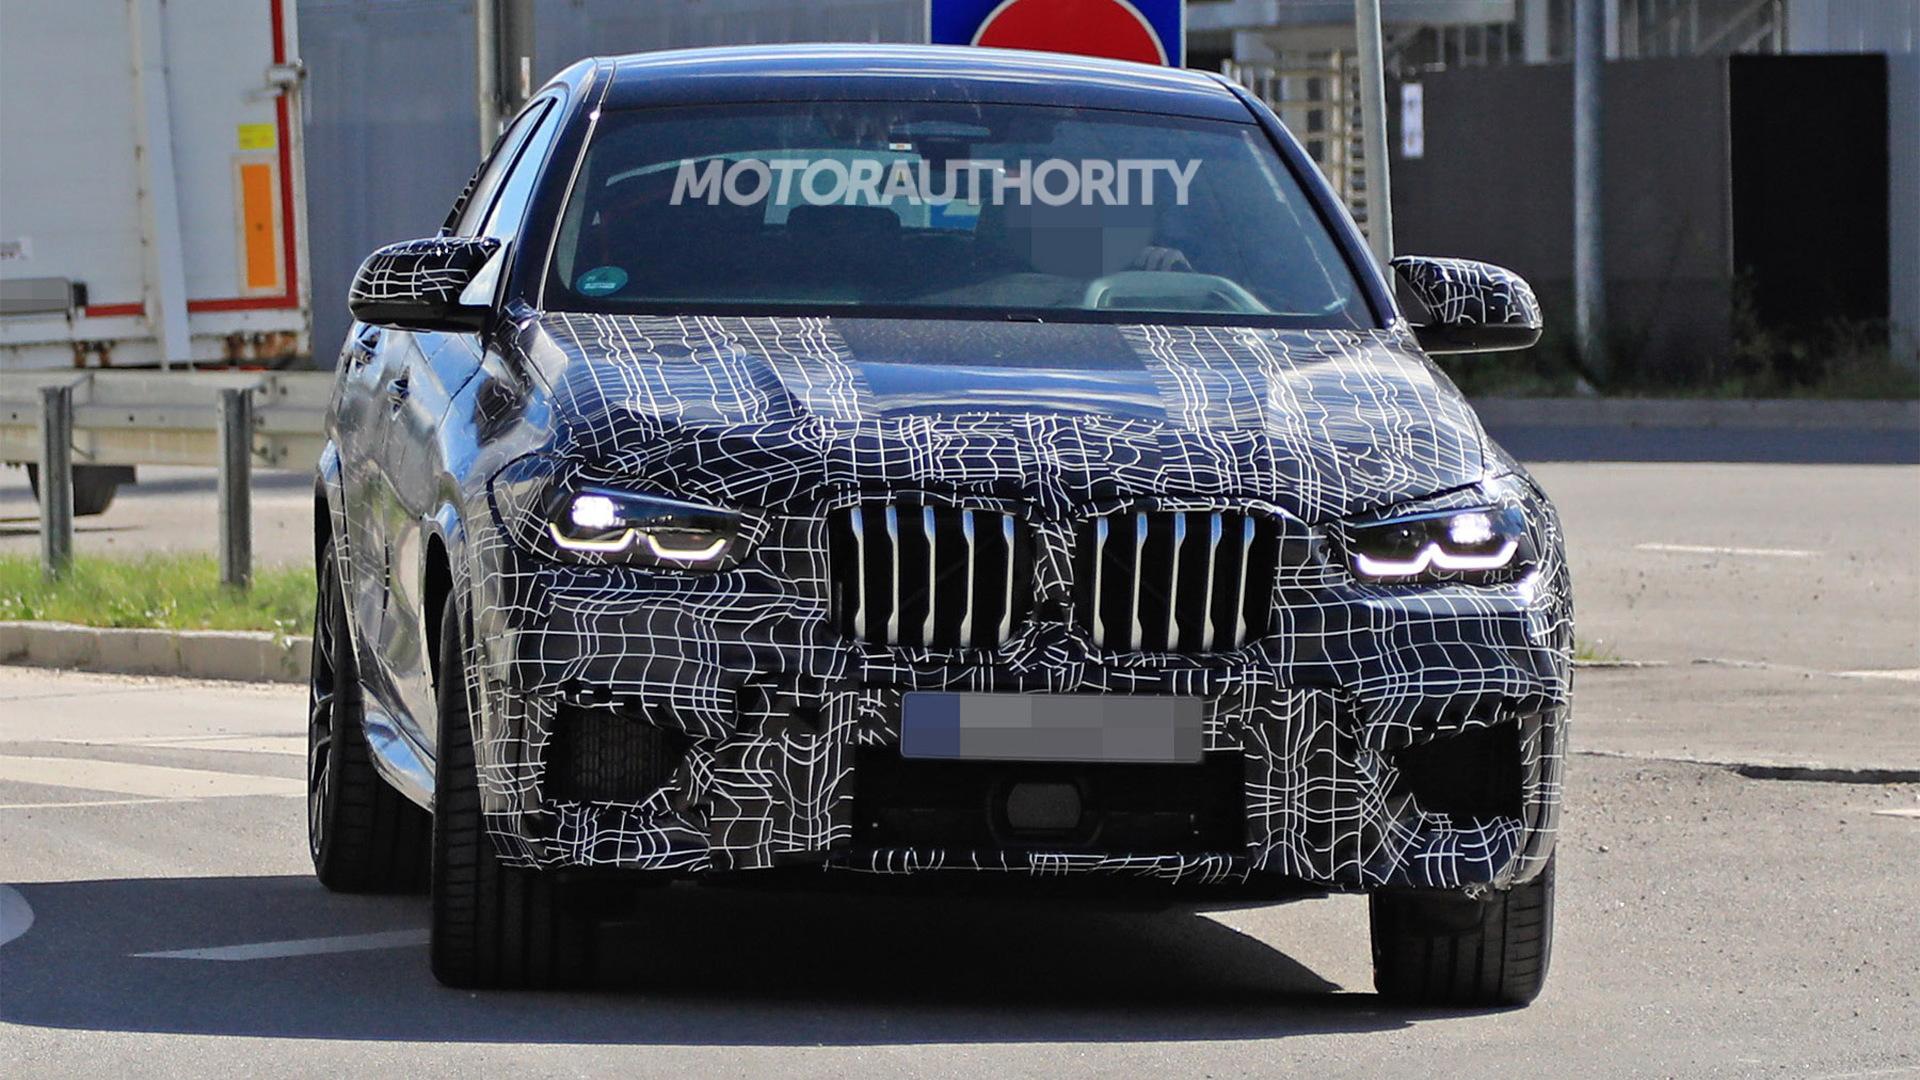 2020 BMW X6 M spy shots - Image via S. Baldauf/SB-Medien